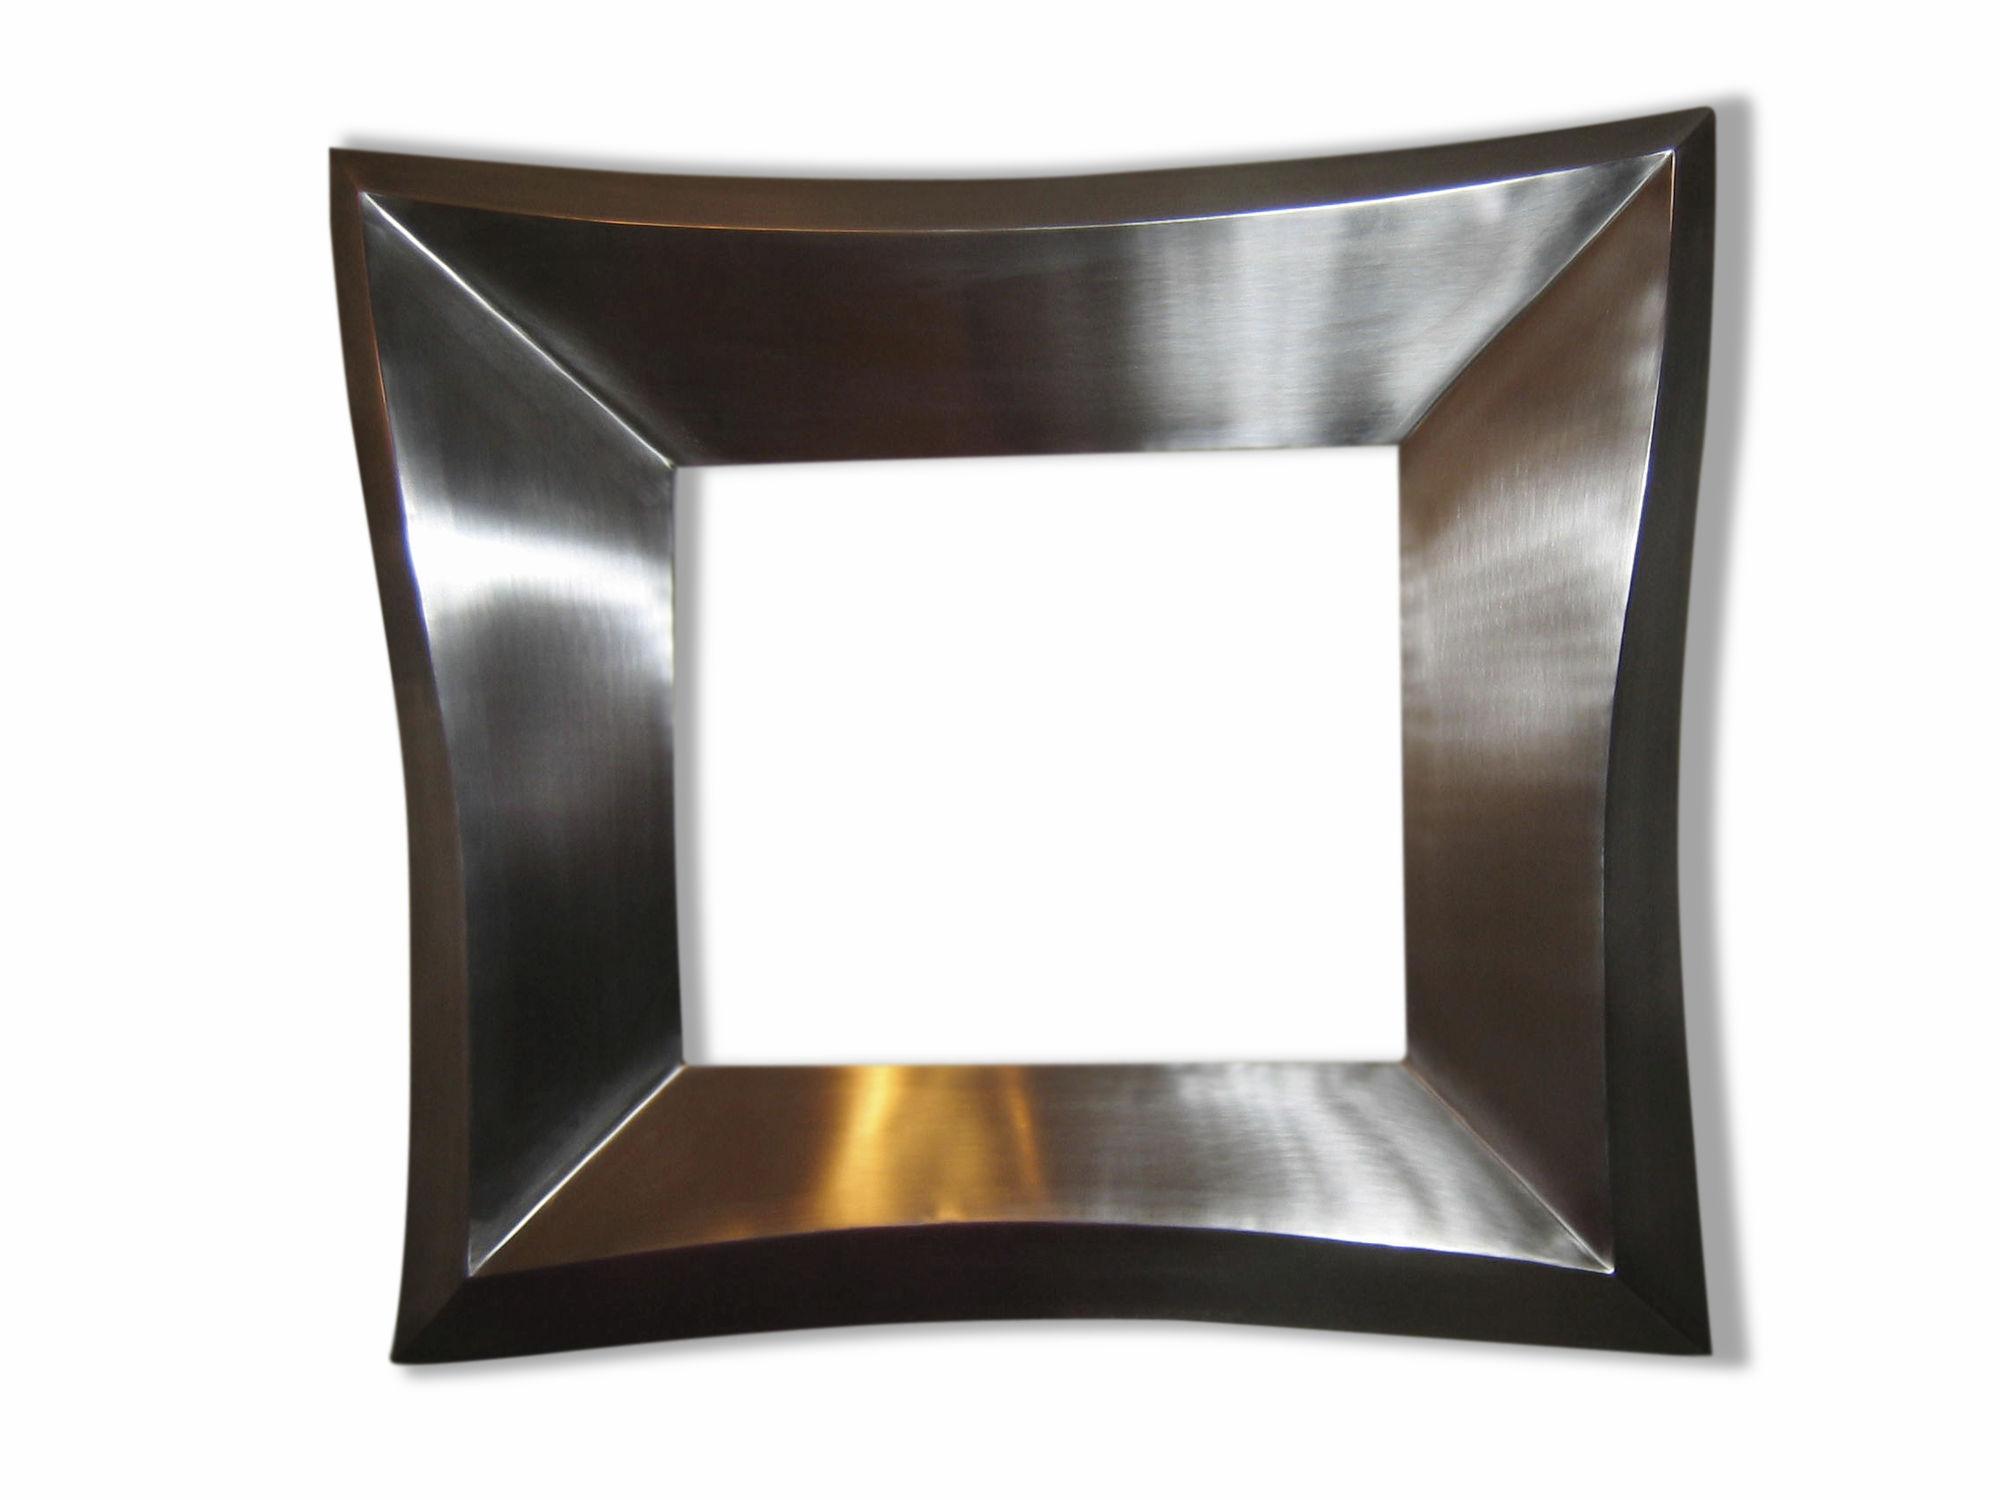 Espejo de pared / suspendido / moderno / rectangular - MARCO - ICI ET LA